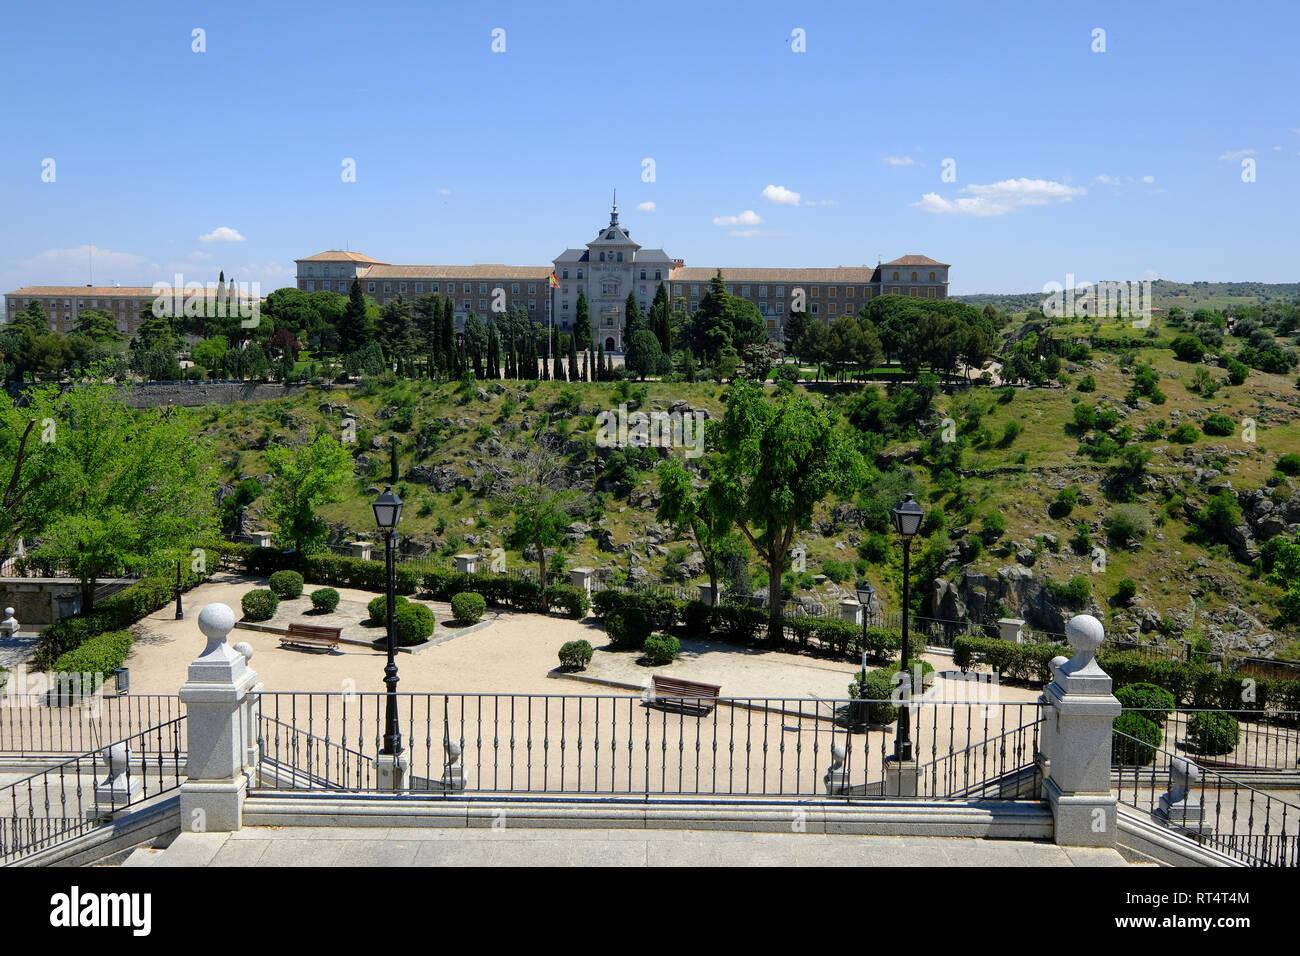 The Alcazar of Toledo Spanish Army Museum, Toledo, Castilla la Mancha, Spain Stock Photo